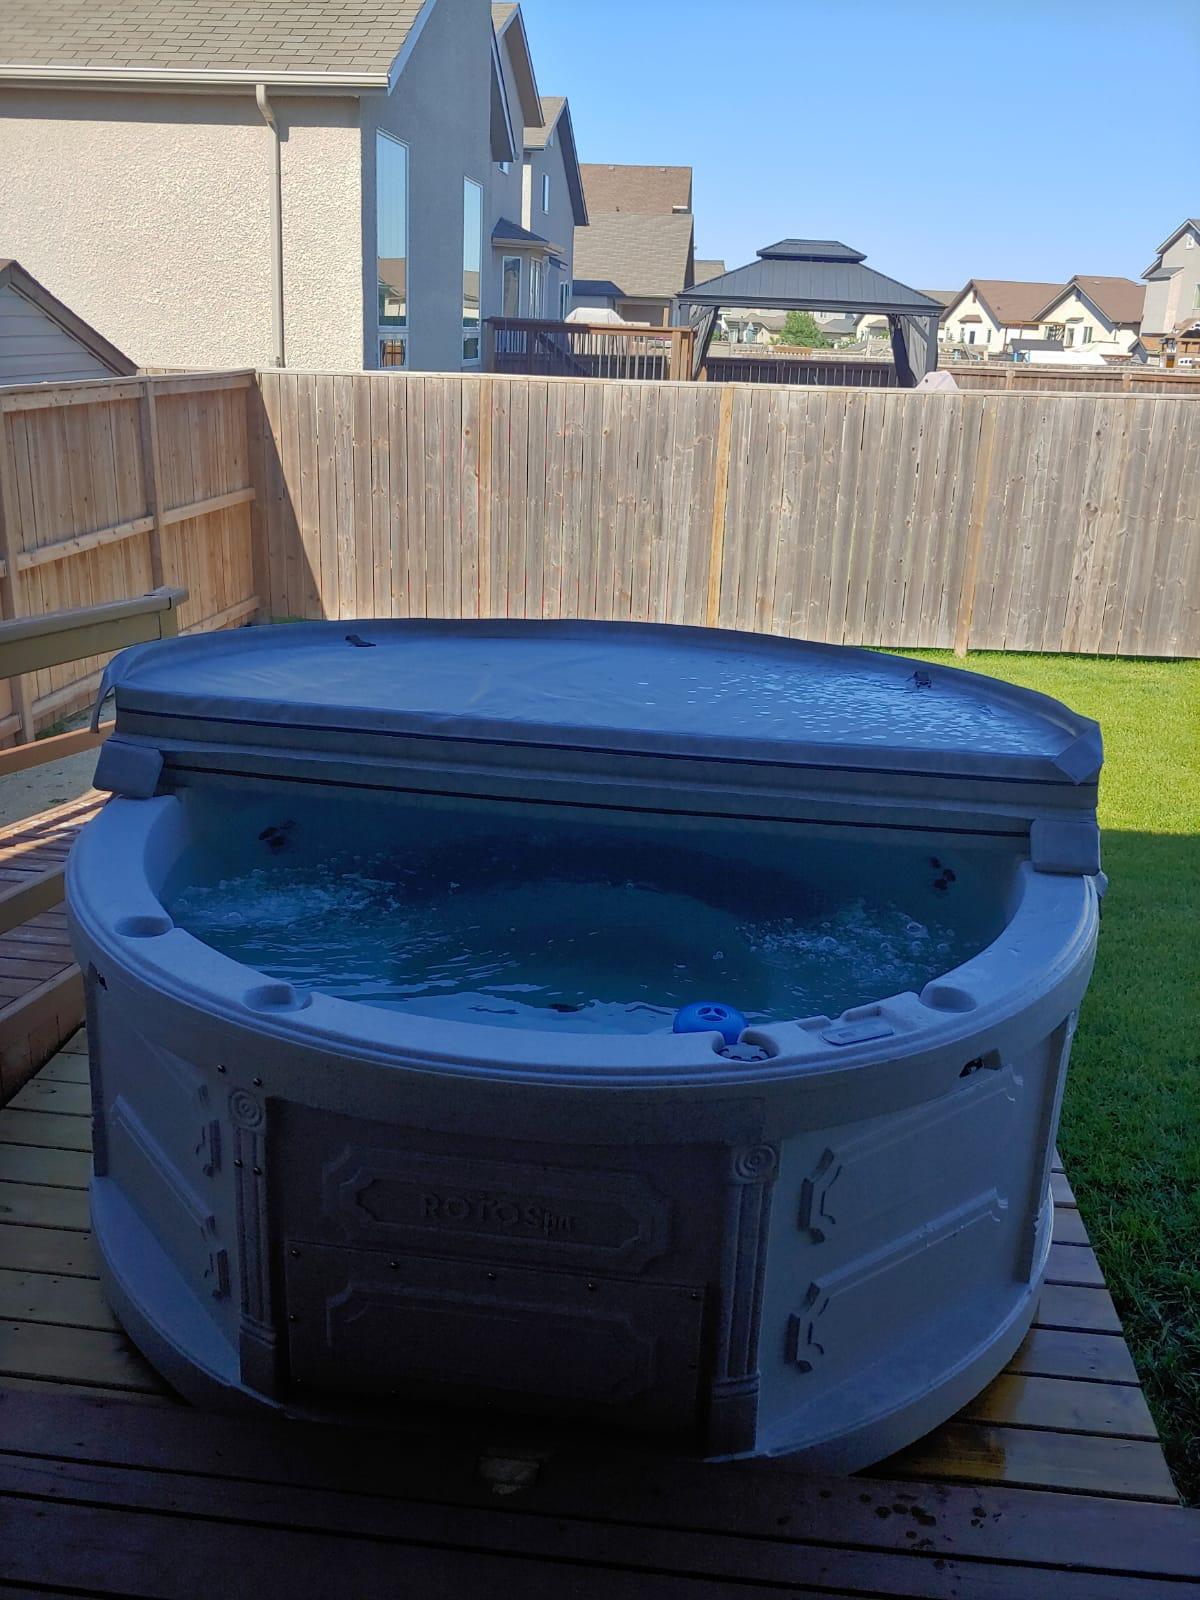 Rent-a-hot-tub-Winnipeg-Manitoba-The-Funky-Keg